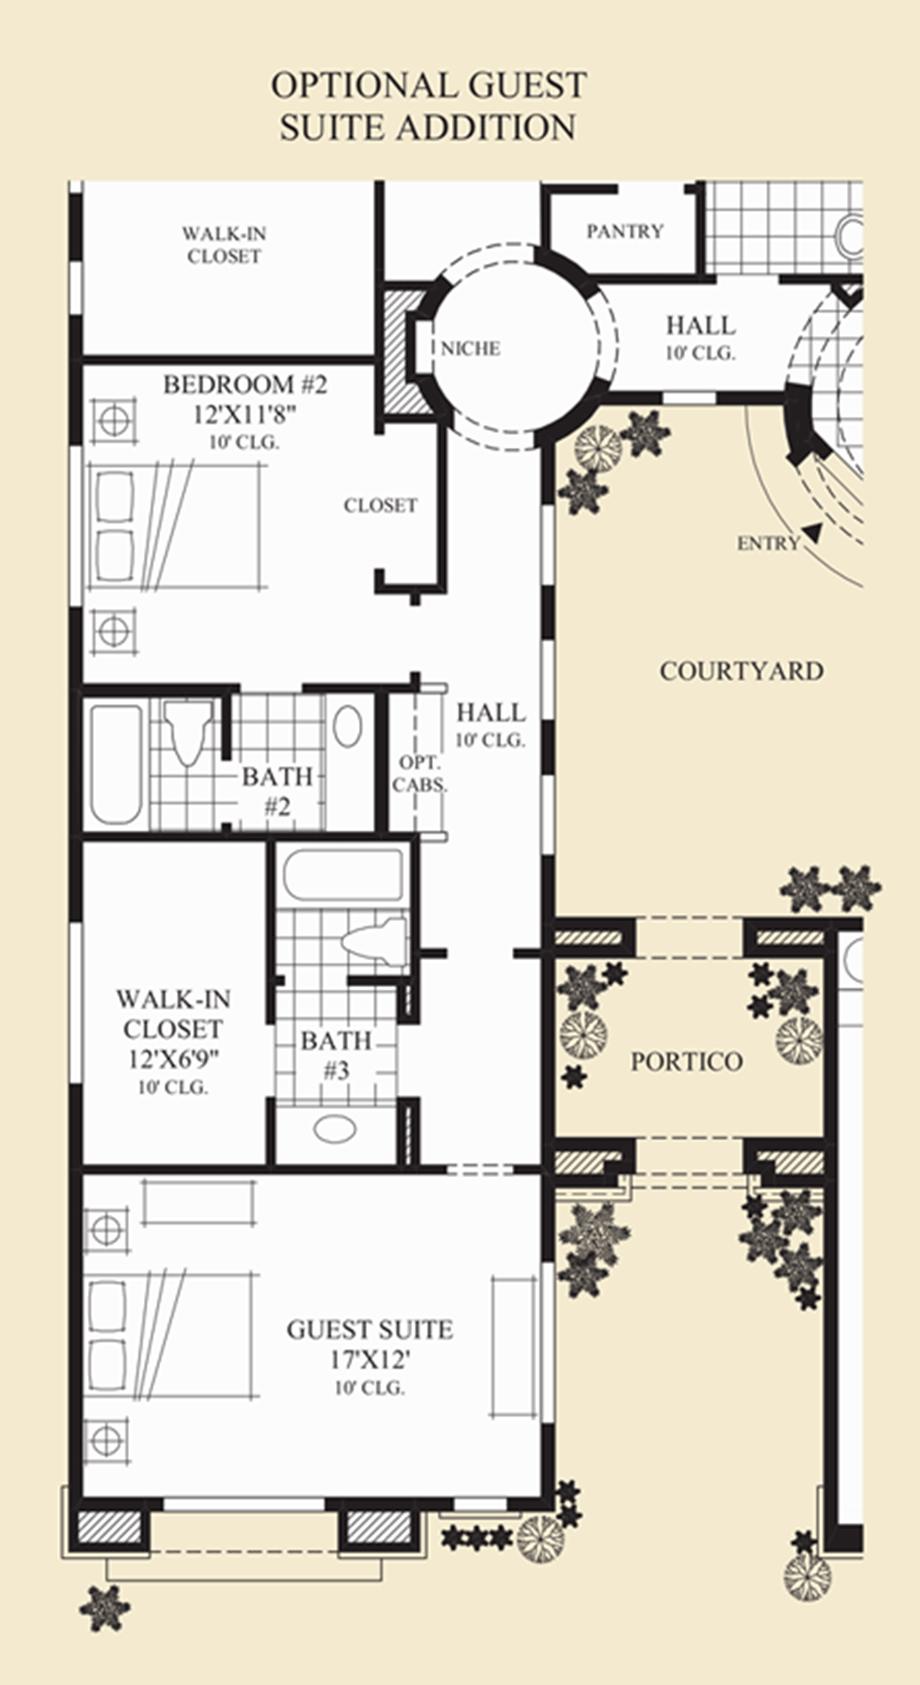 Optional Guest Suite Addition Floor Plan